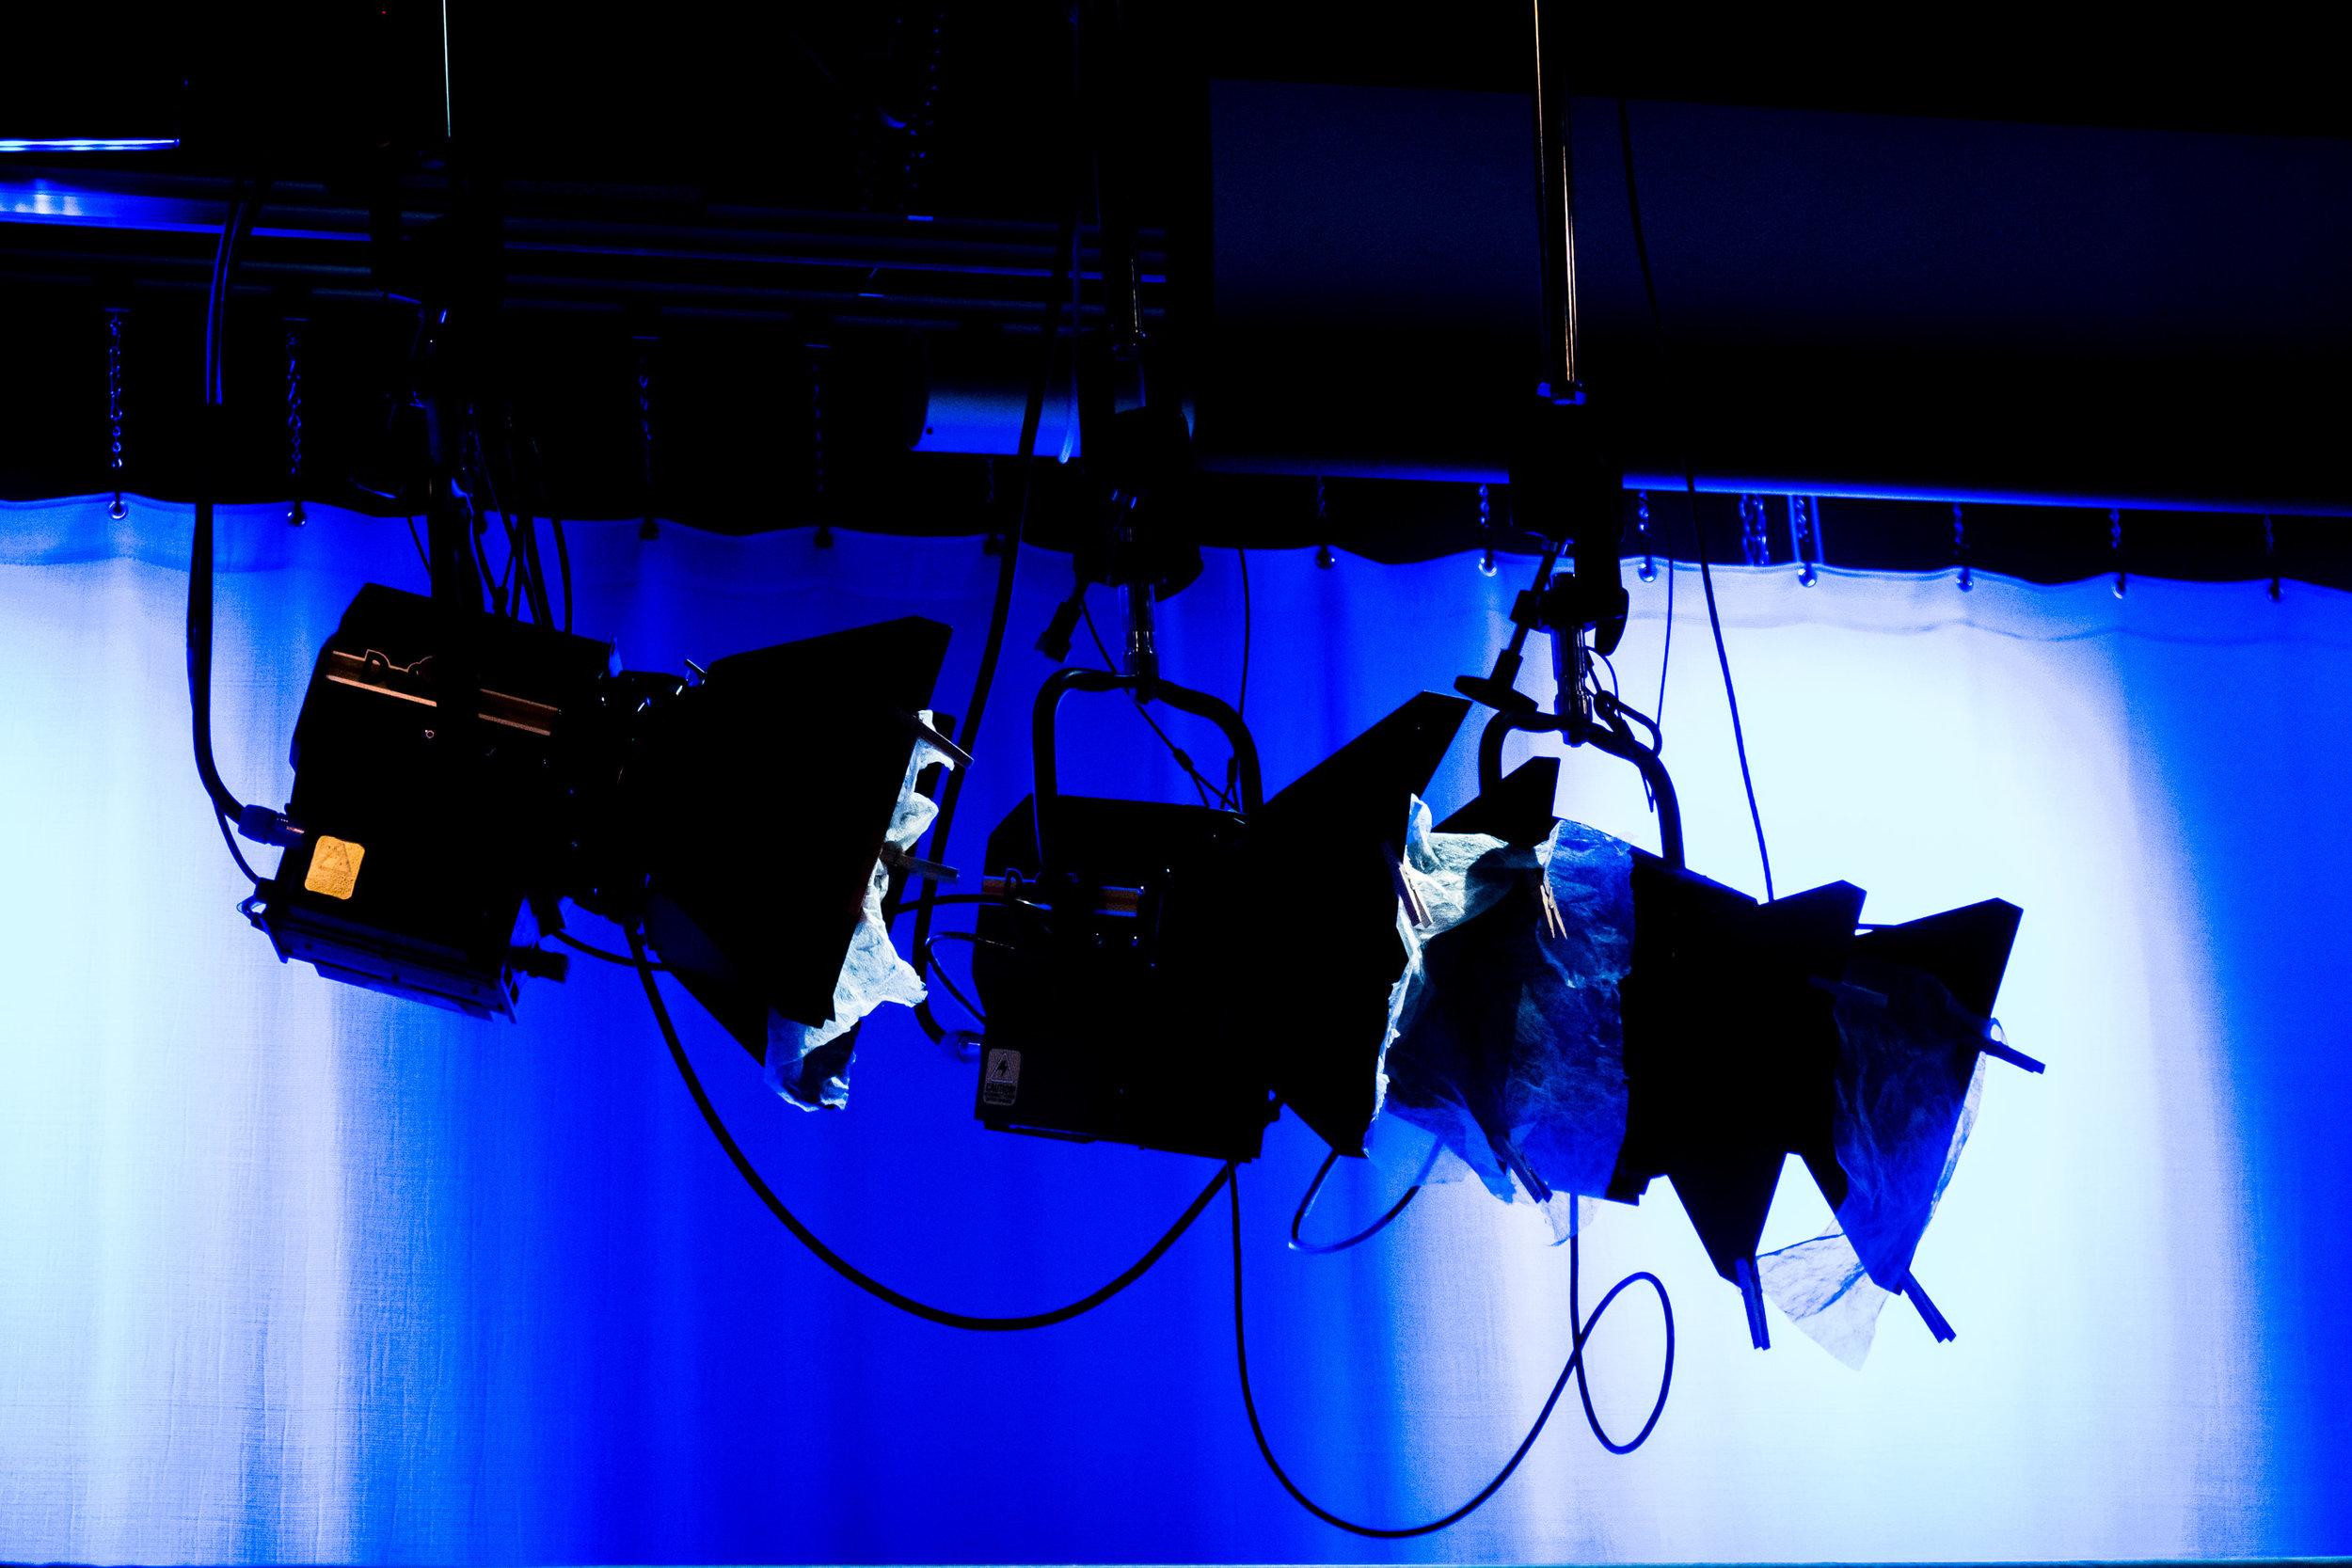 Lights, Cameras, Action